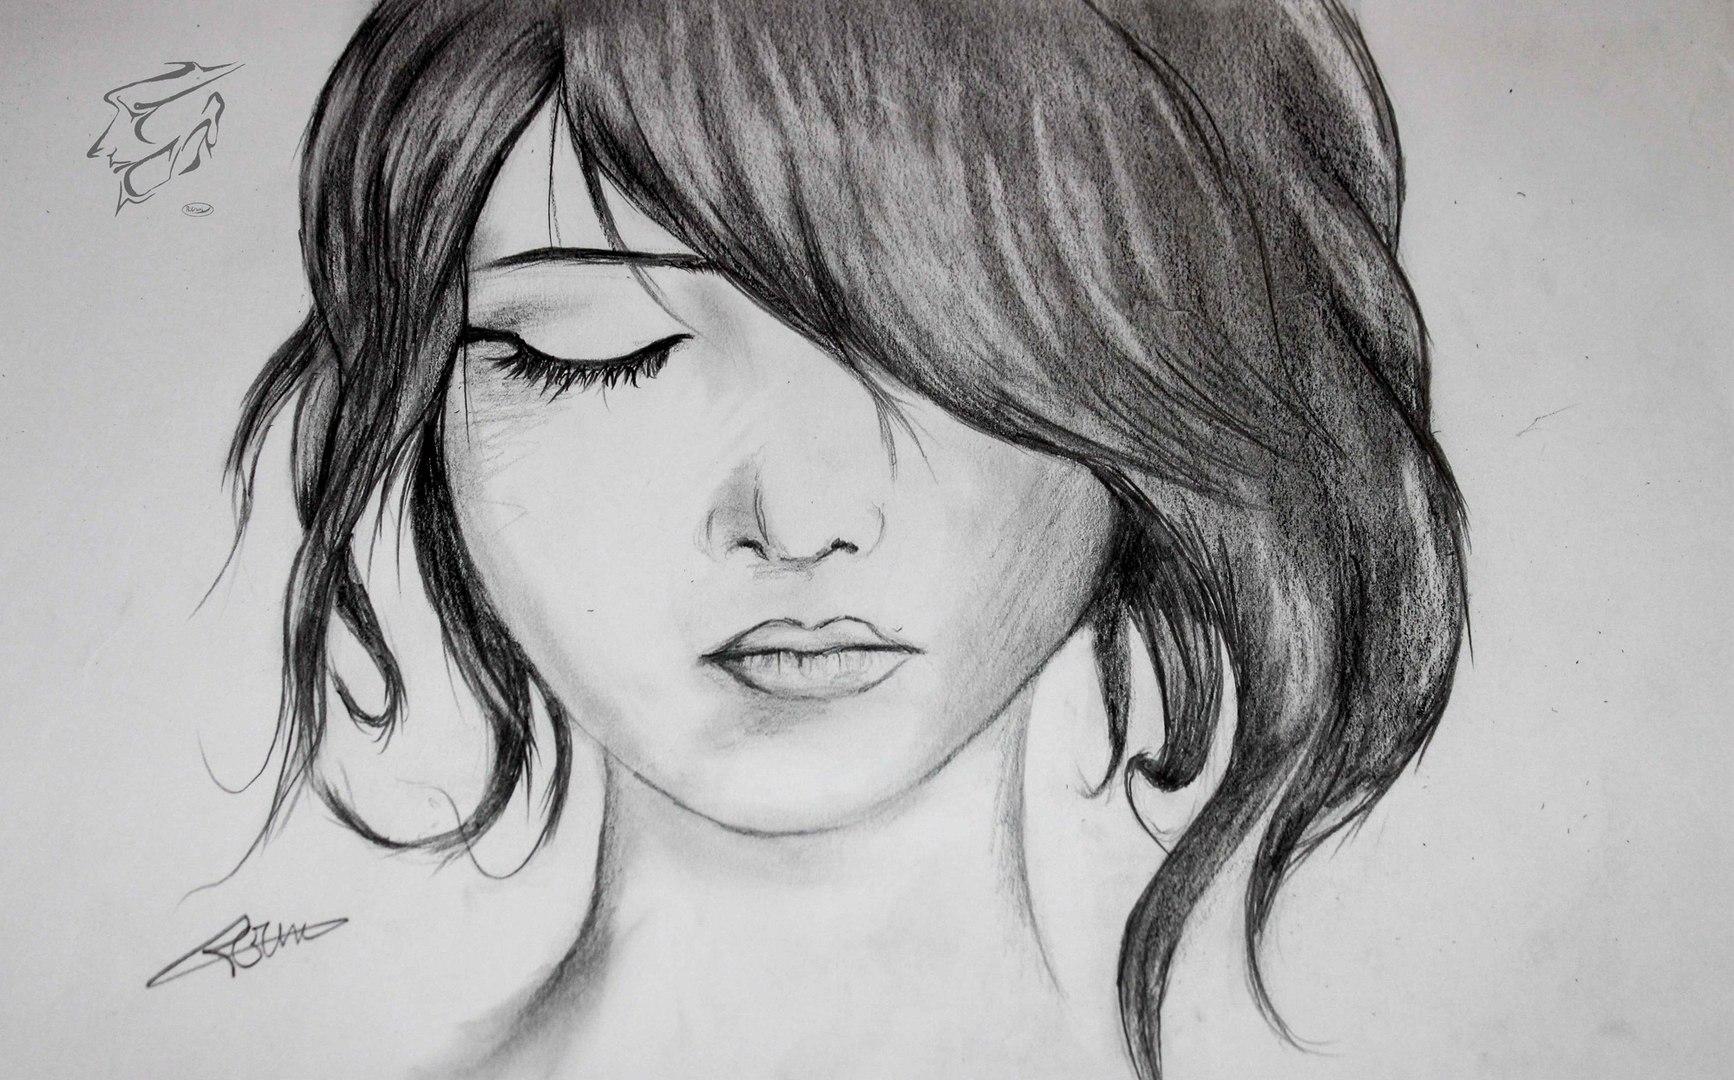 How To Draw A Girl رسم شعر فتاة بقلم الرصاص Video Dailymotion